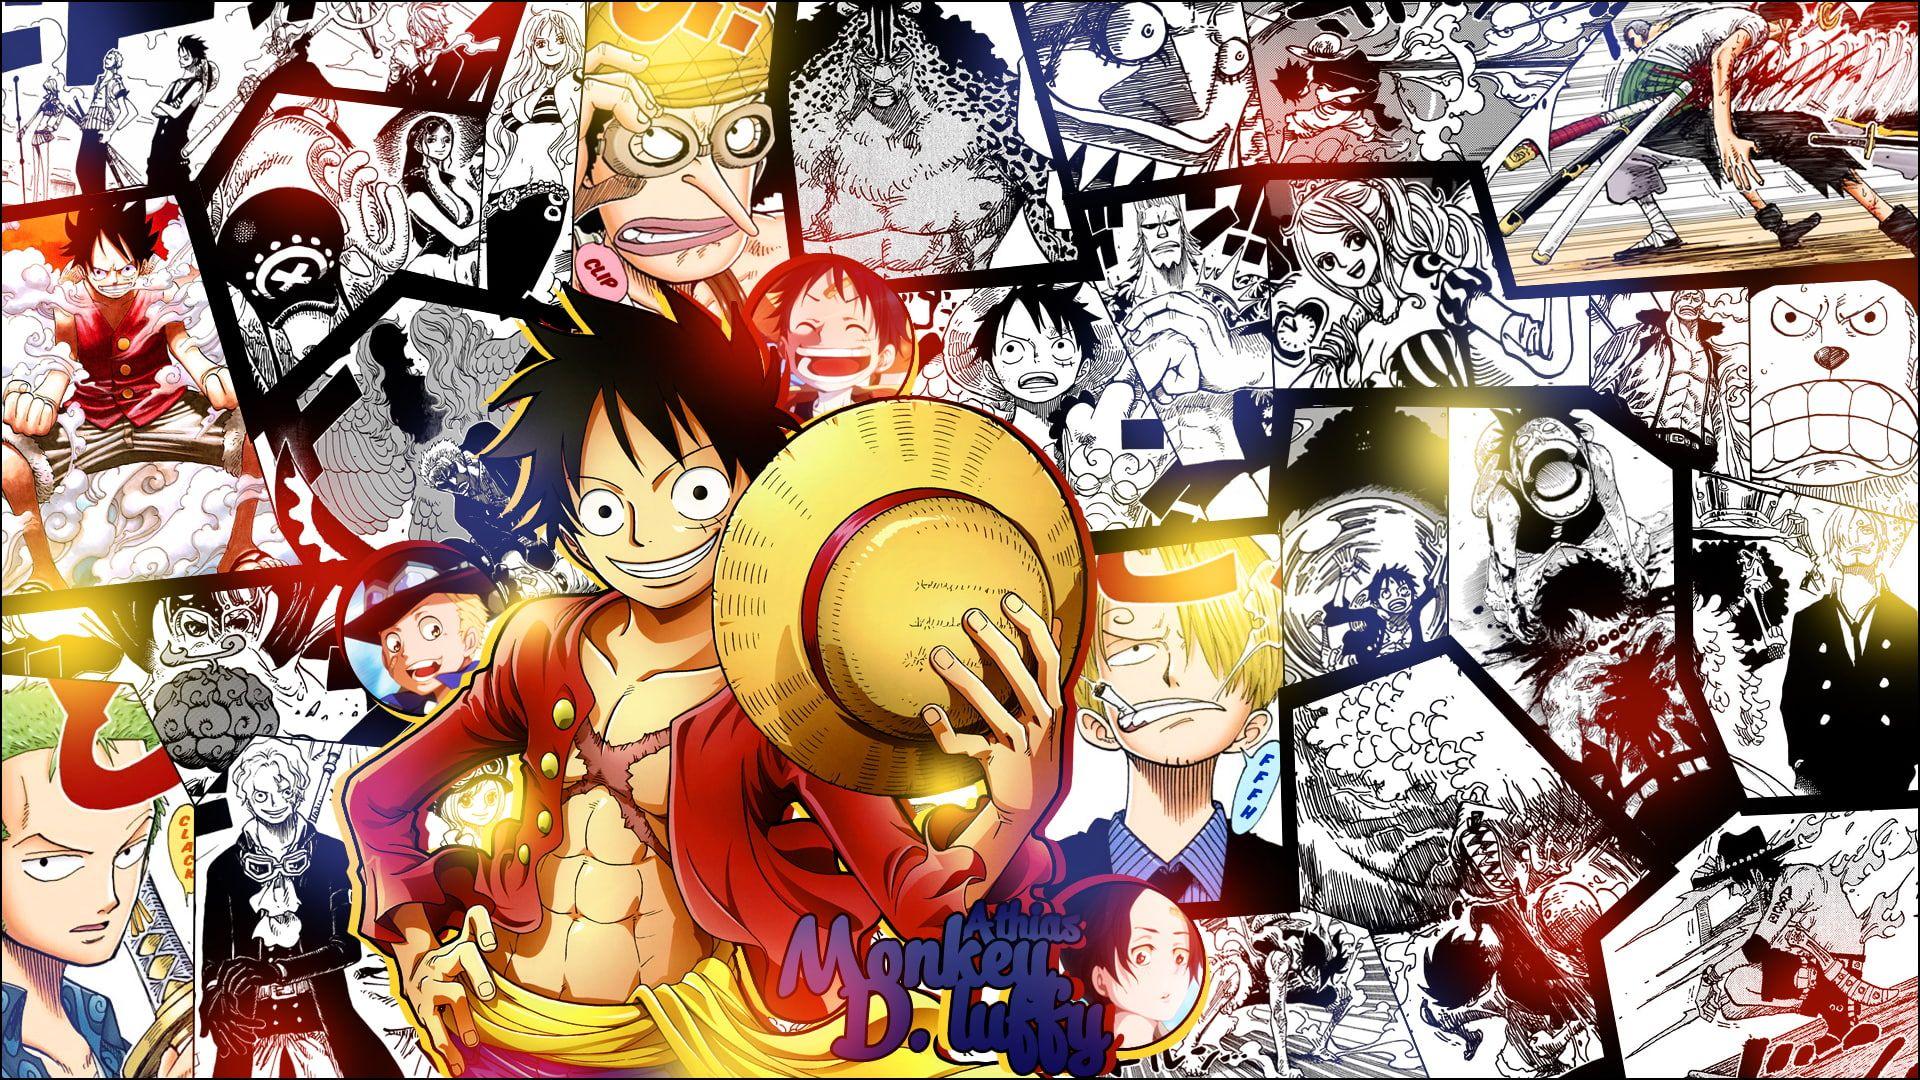 Anime One Piece Anime Boys Hat 1080p Wallpaper Hdwallpaper Desktop One Piece Wallpaper Iphone Anime Hd Anime Wallpapers All anime wallpapers hd